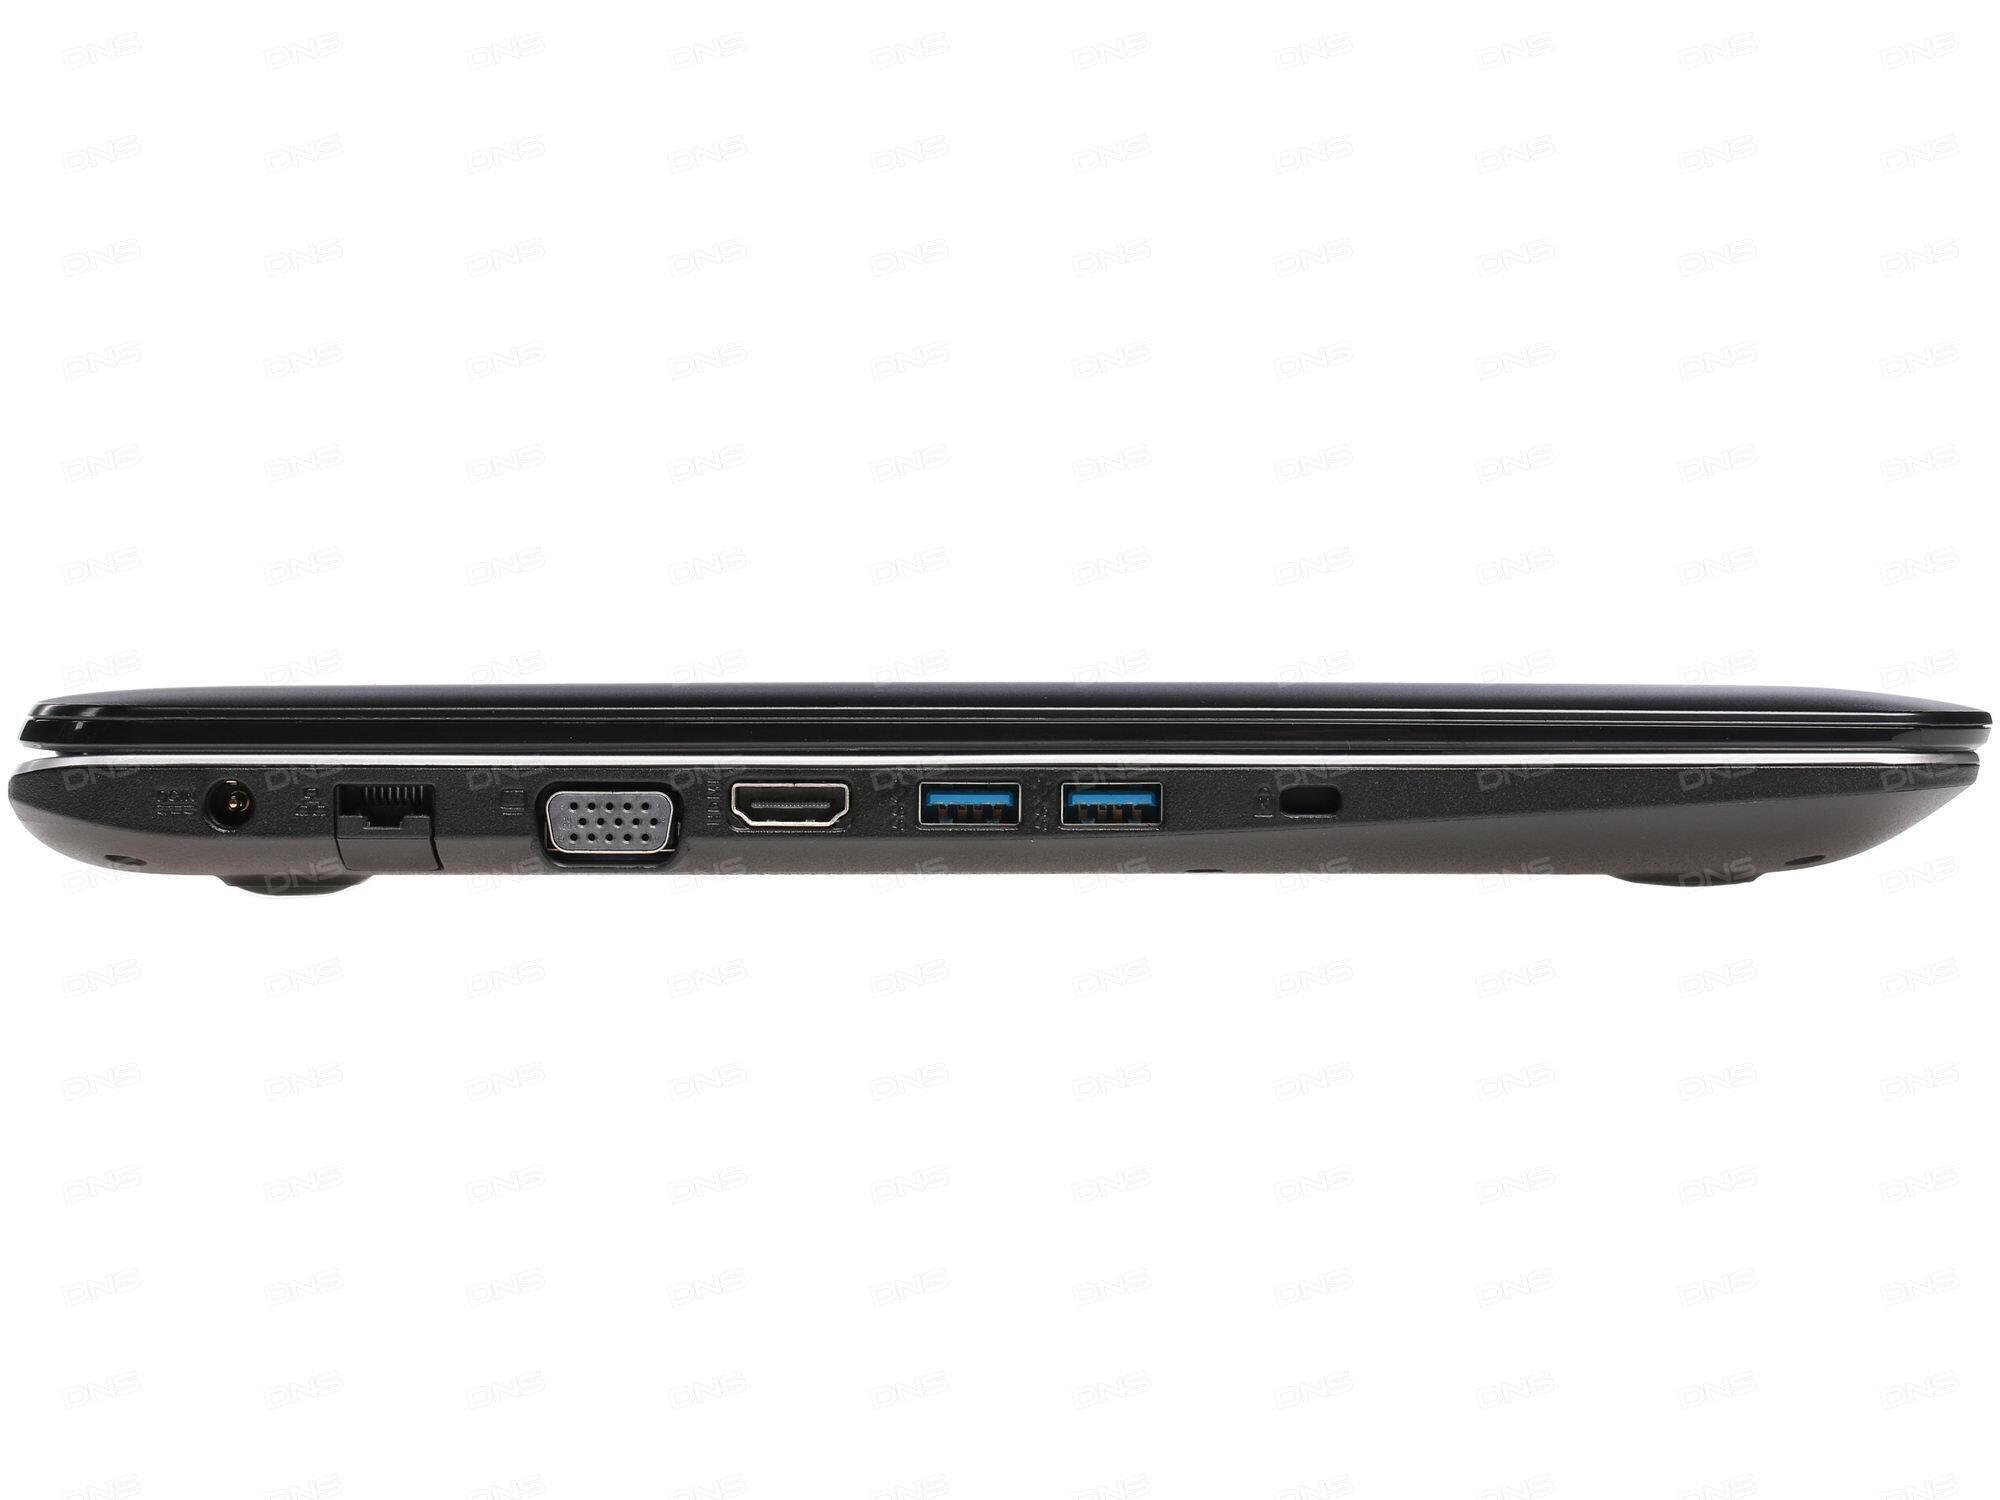 Драйвера Intel Core I5 для ноутбука Asus